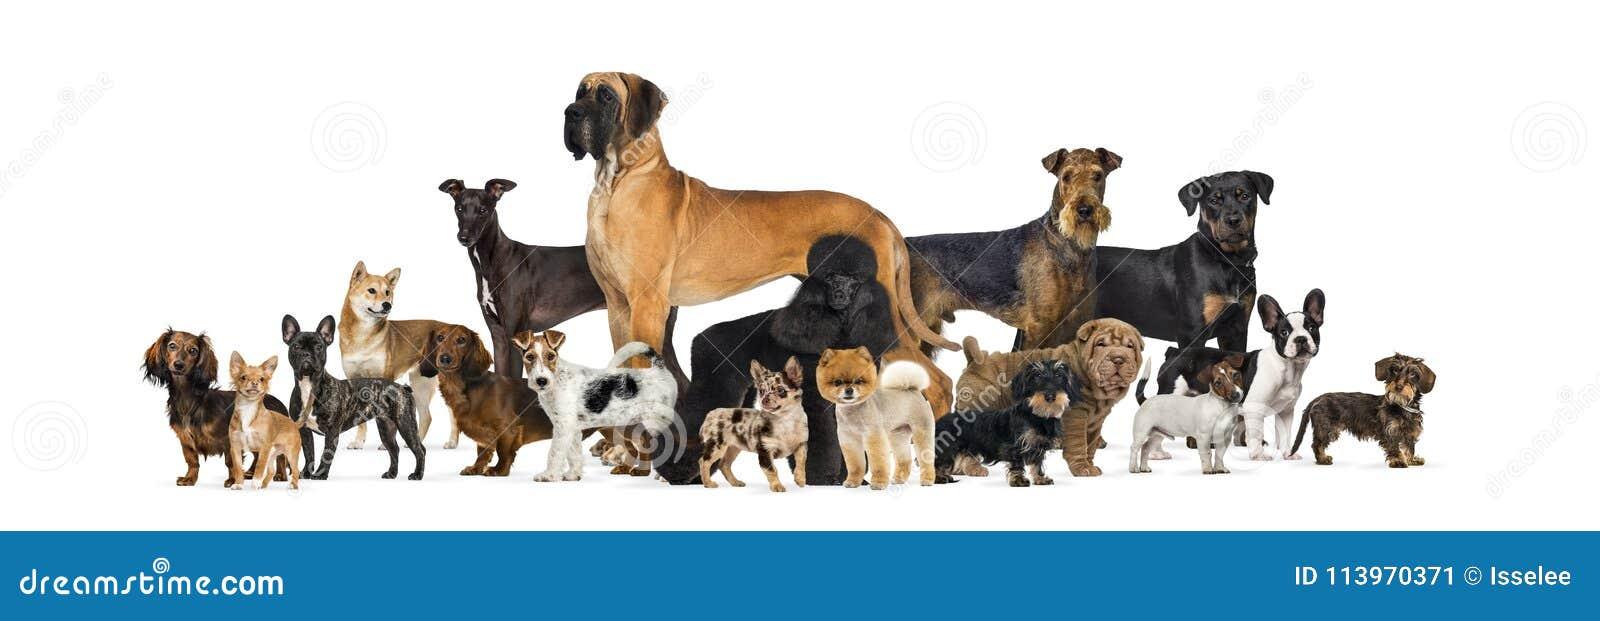 Stor grupp av rashundar i studio mot vit bakgrund